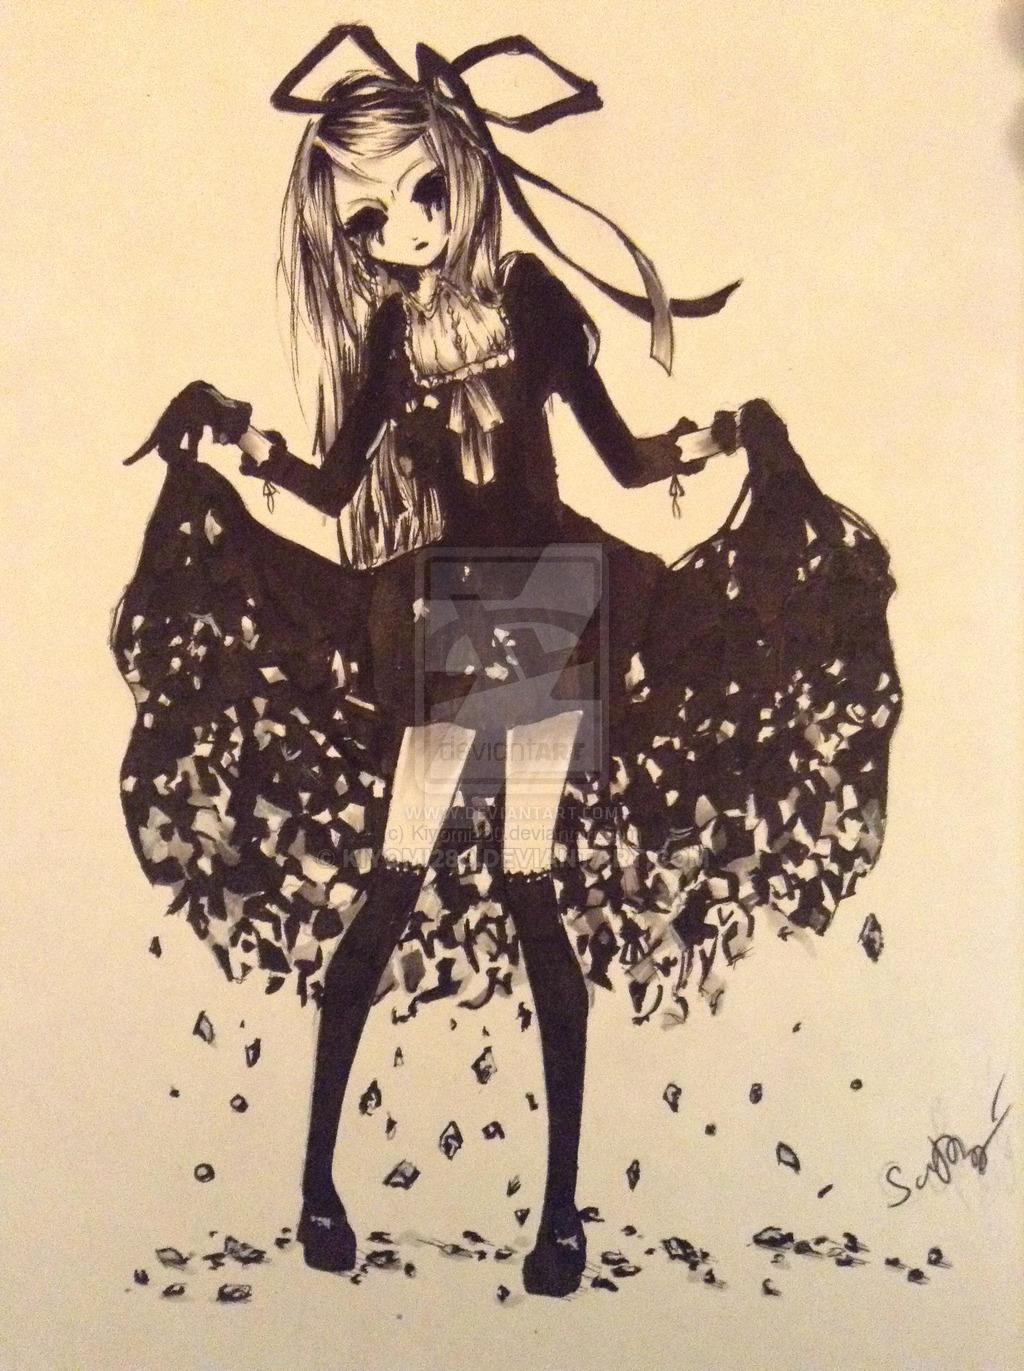 Creepy Girl By Kiyomi280 On DeviantArt